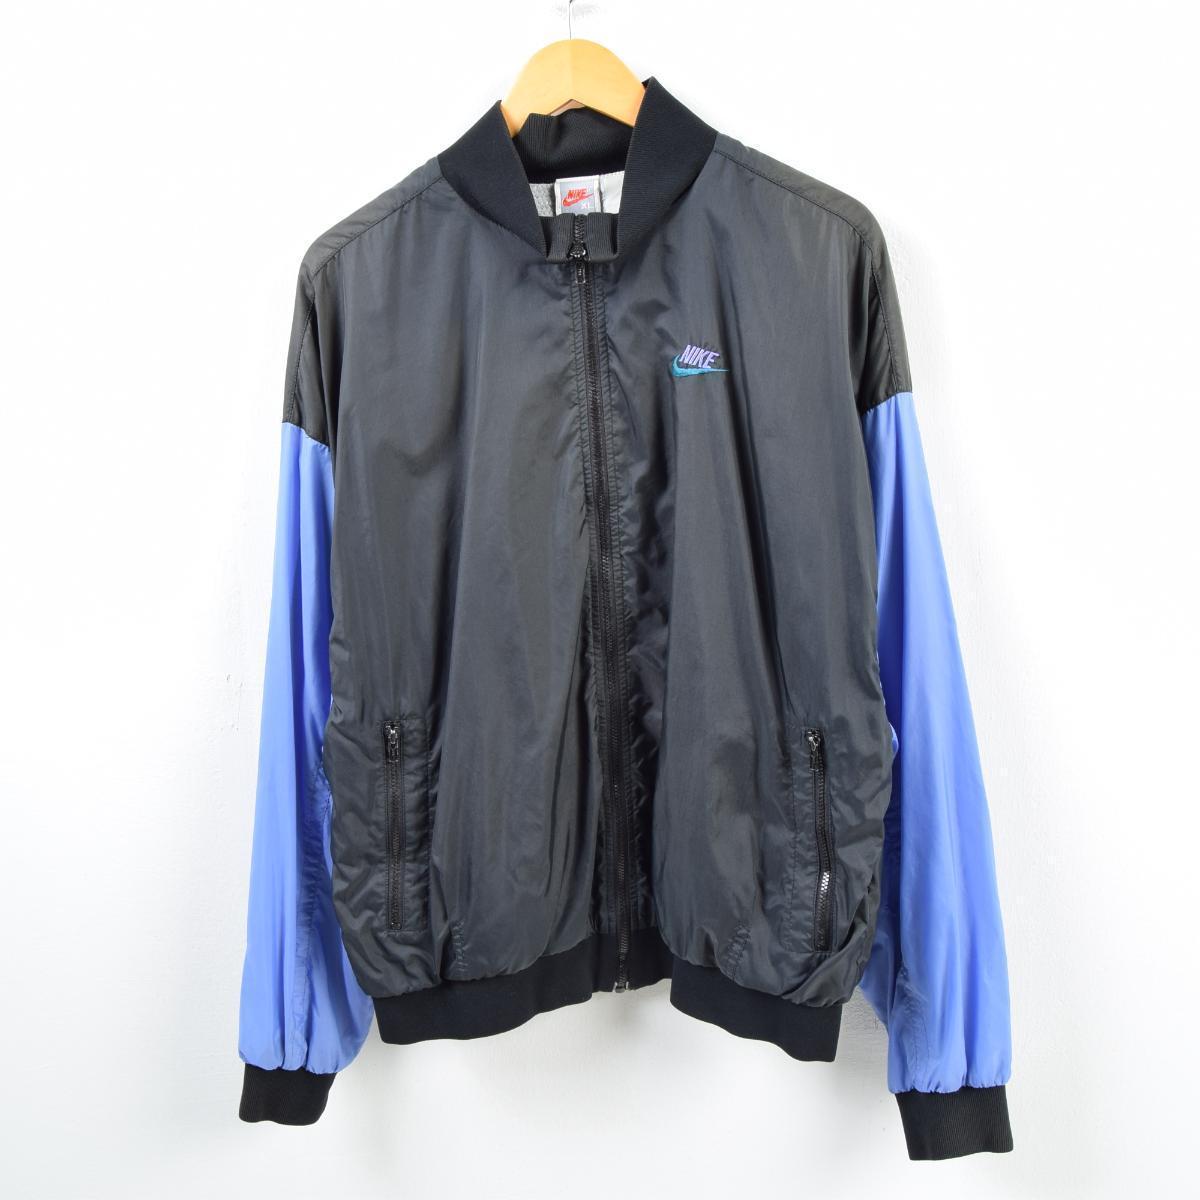 cb823cbd71 90s Nike NIKE silver tag decalogo big logo nylon jacket men XL  wba4972